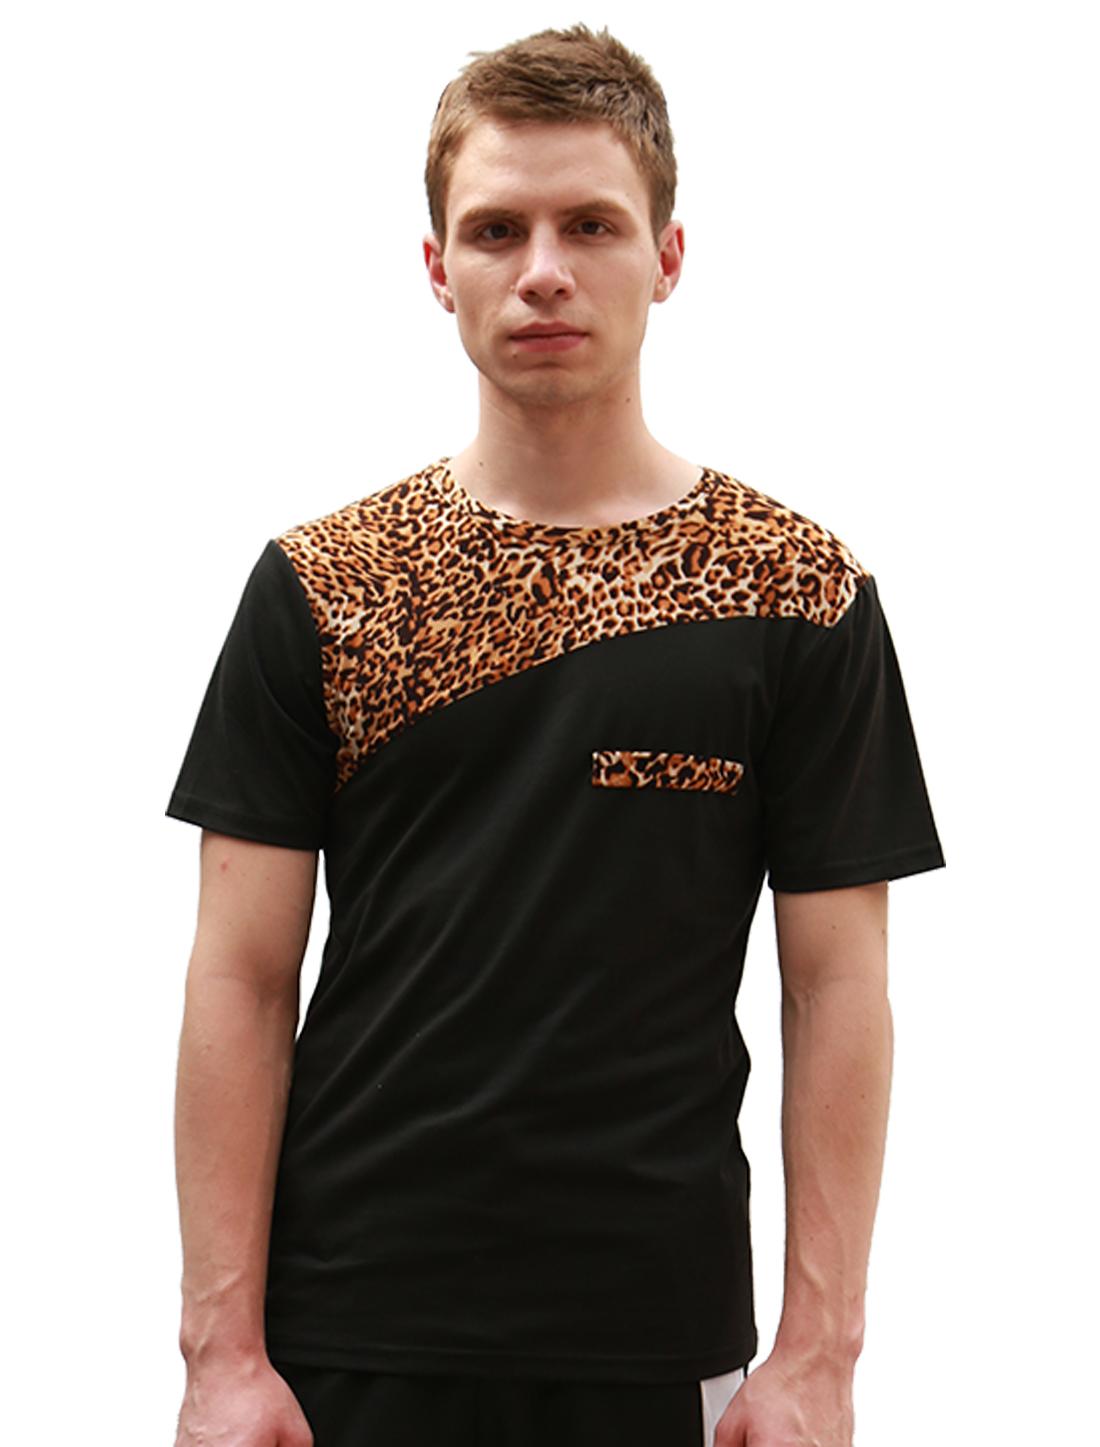 Men Black V-neck Leopard Prints Detail Stretch Simple Tee Shirt L